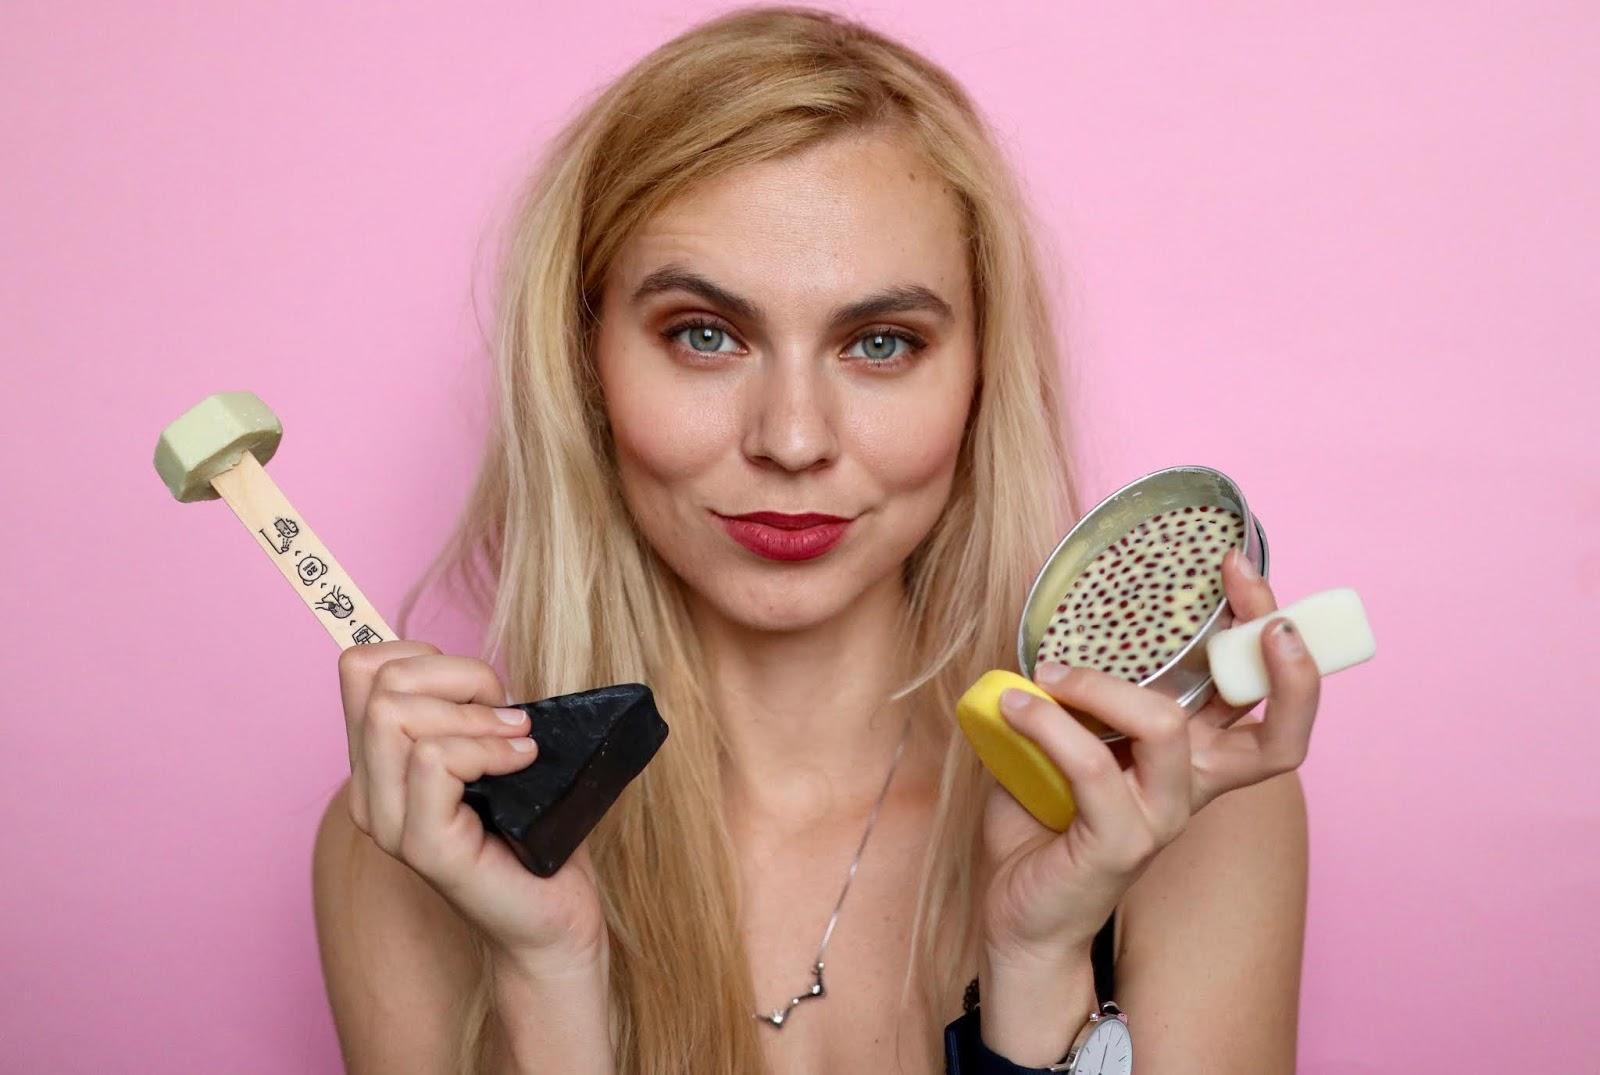 kozmetika bez obalu lush a zero waste